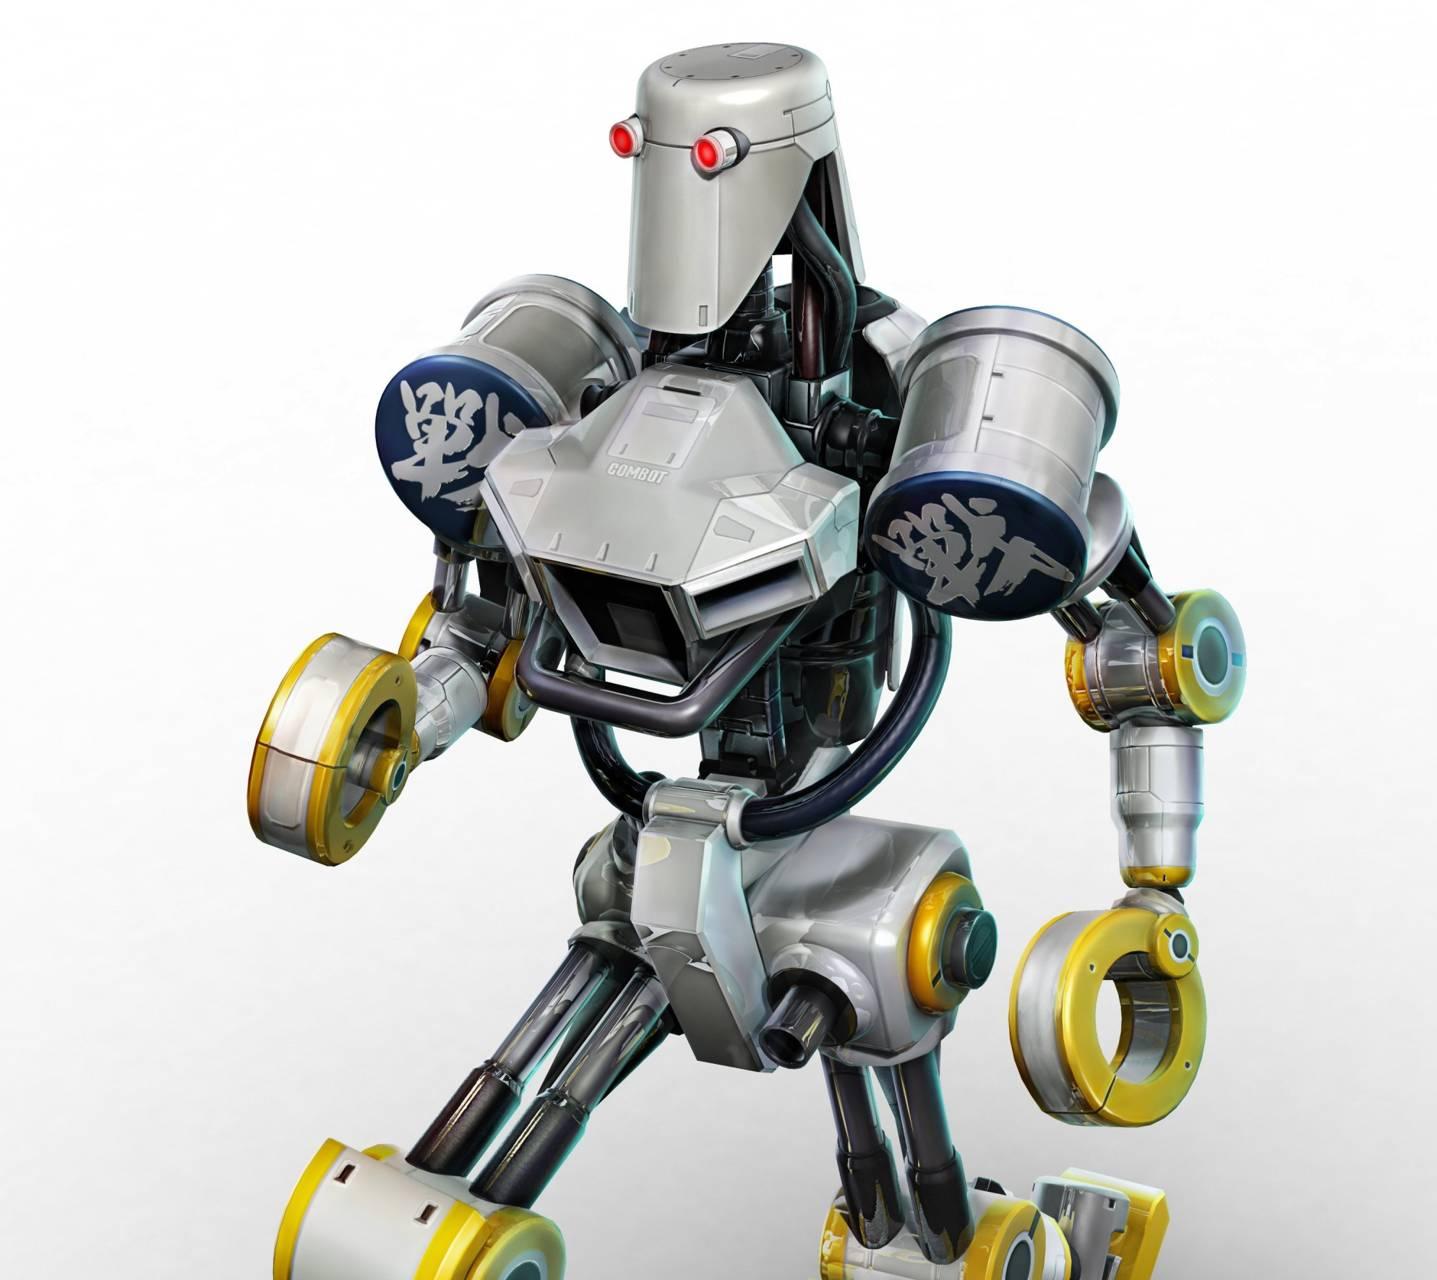 Combot